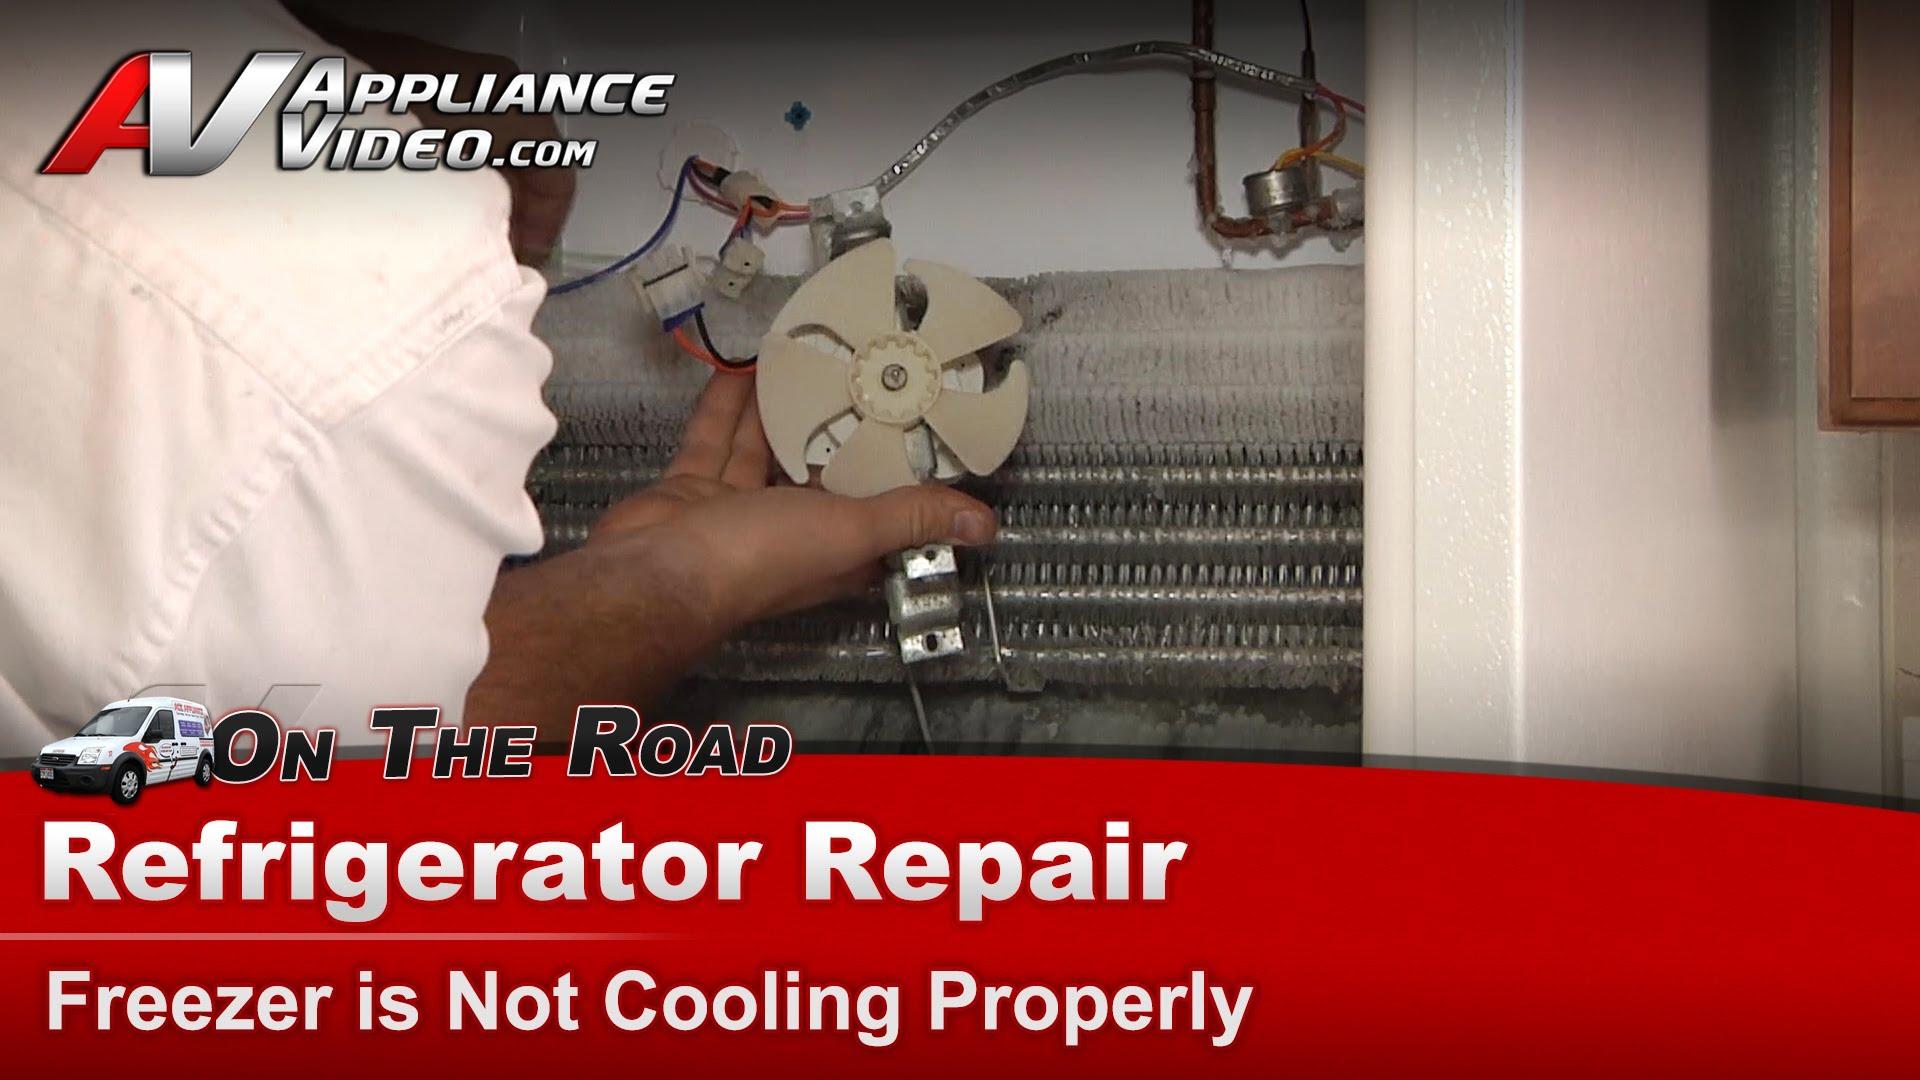 Hotpoint Hts16hbmfrww Refrigerator Repair Freezer Is Not